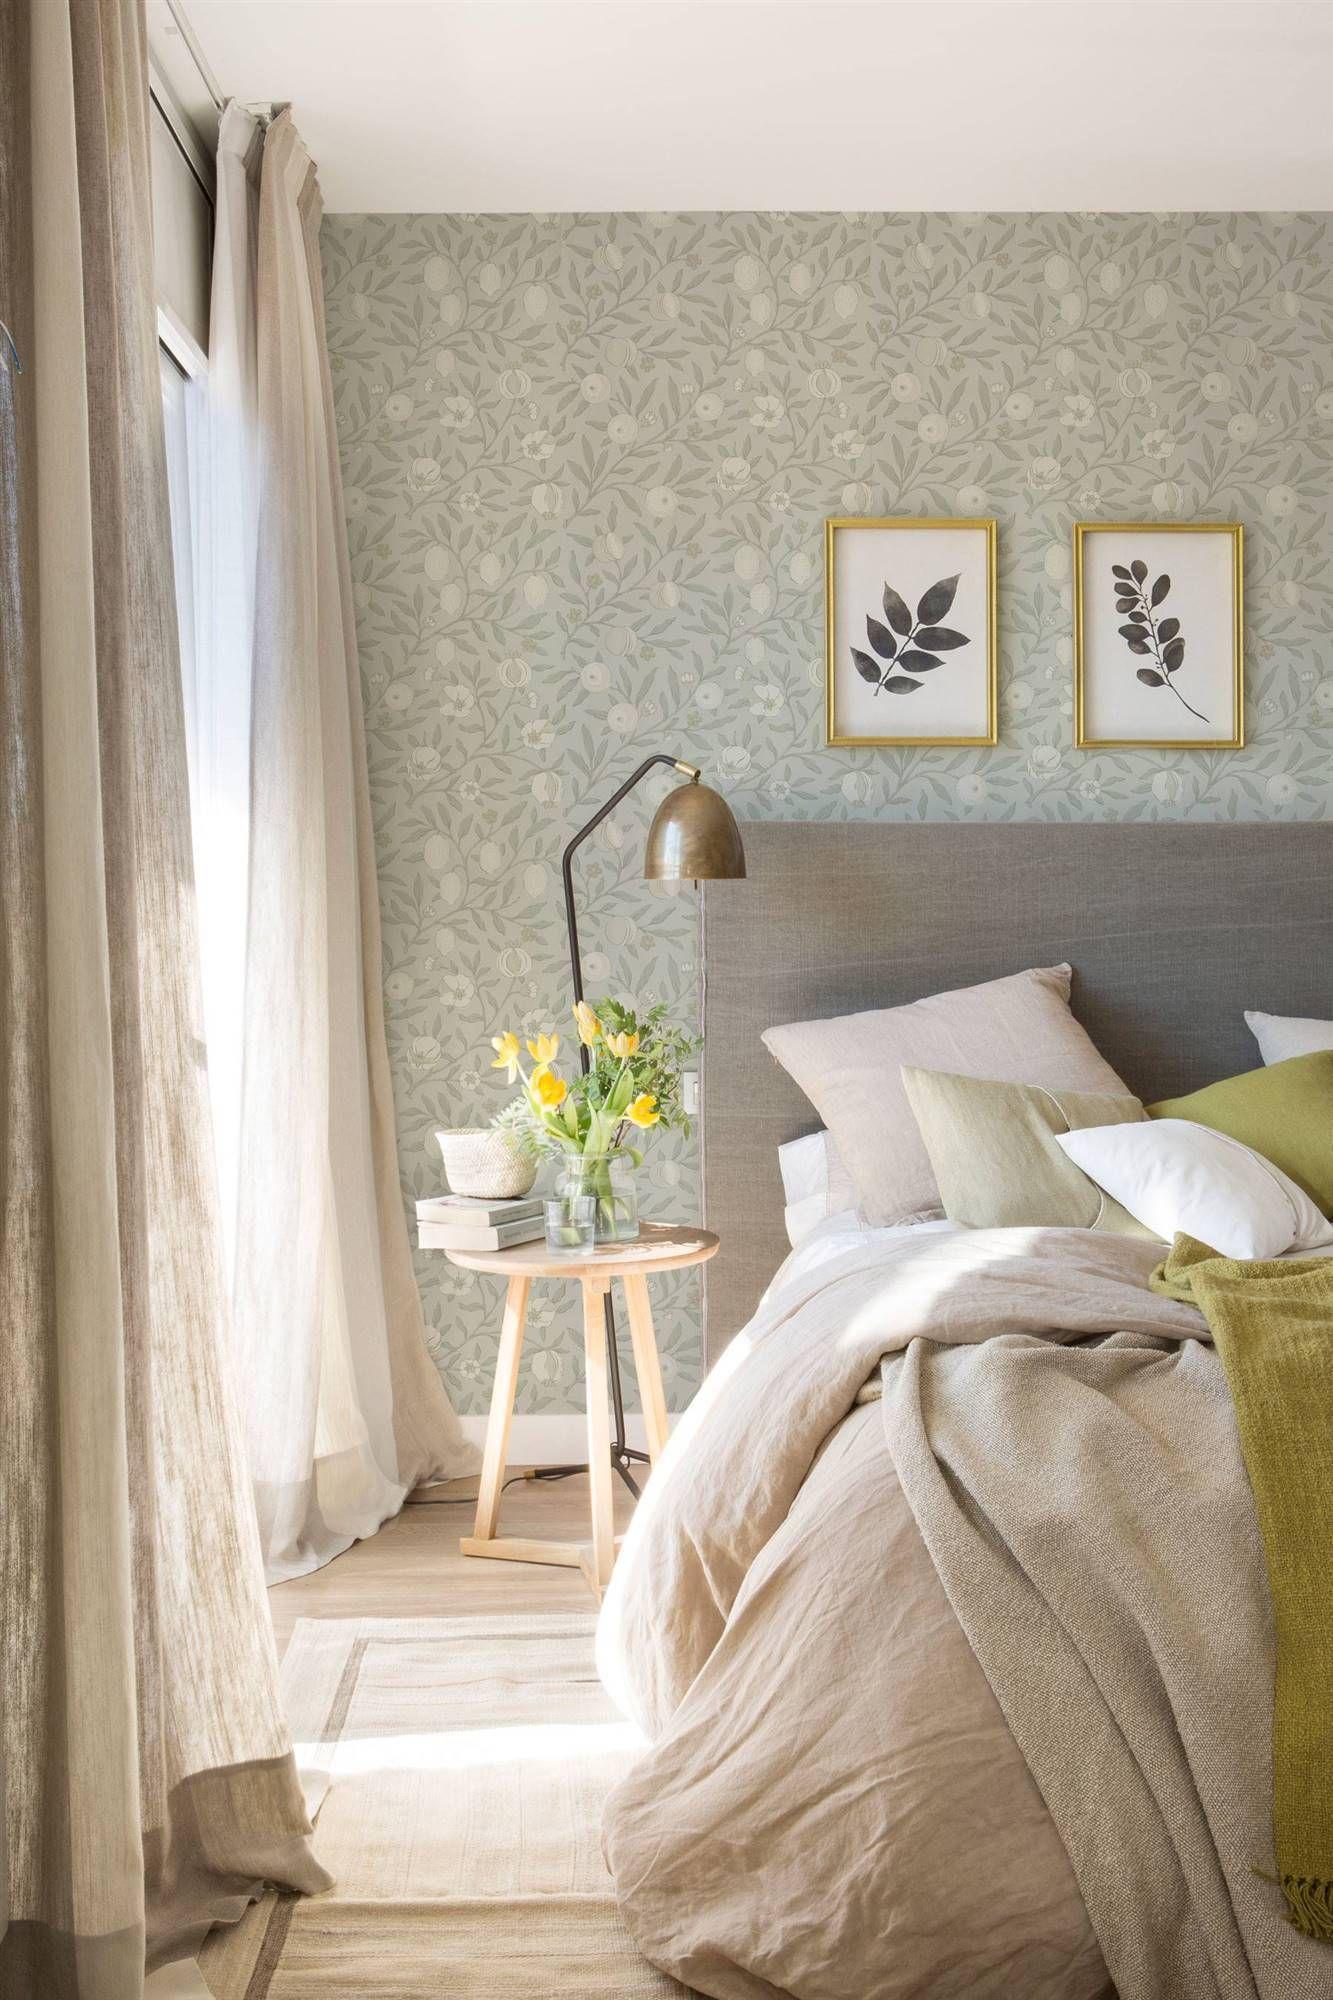 44+ Papel pintado para dormitorios de matrimonio modernos ideas